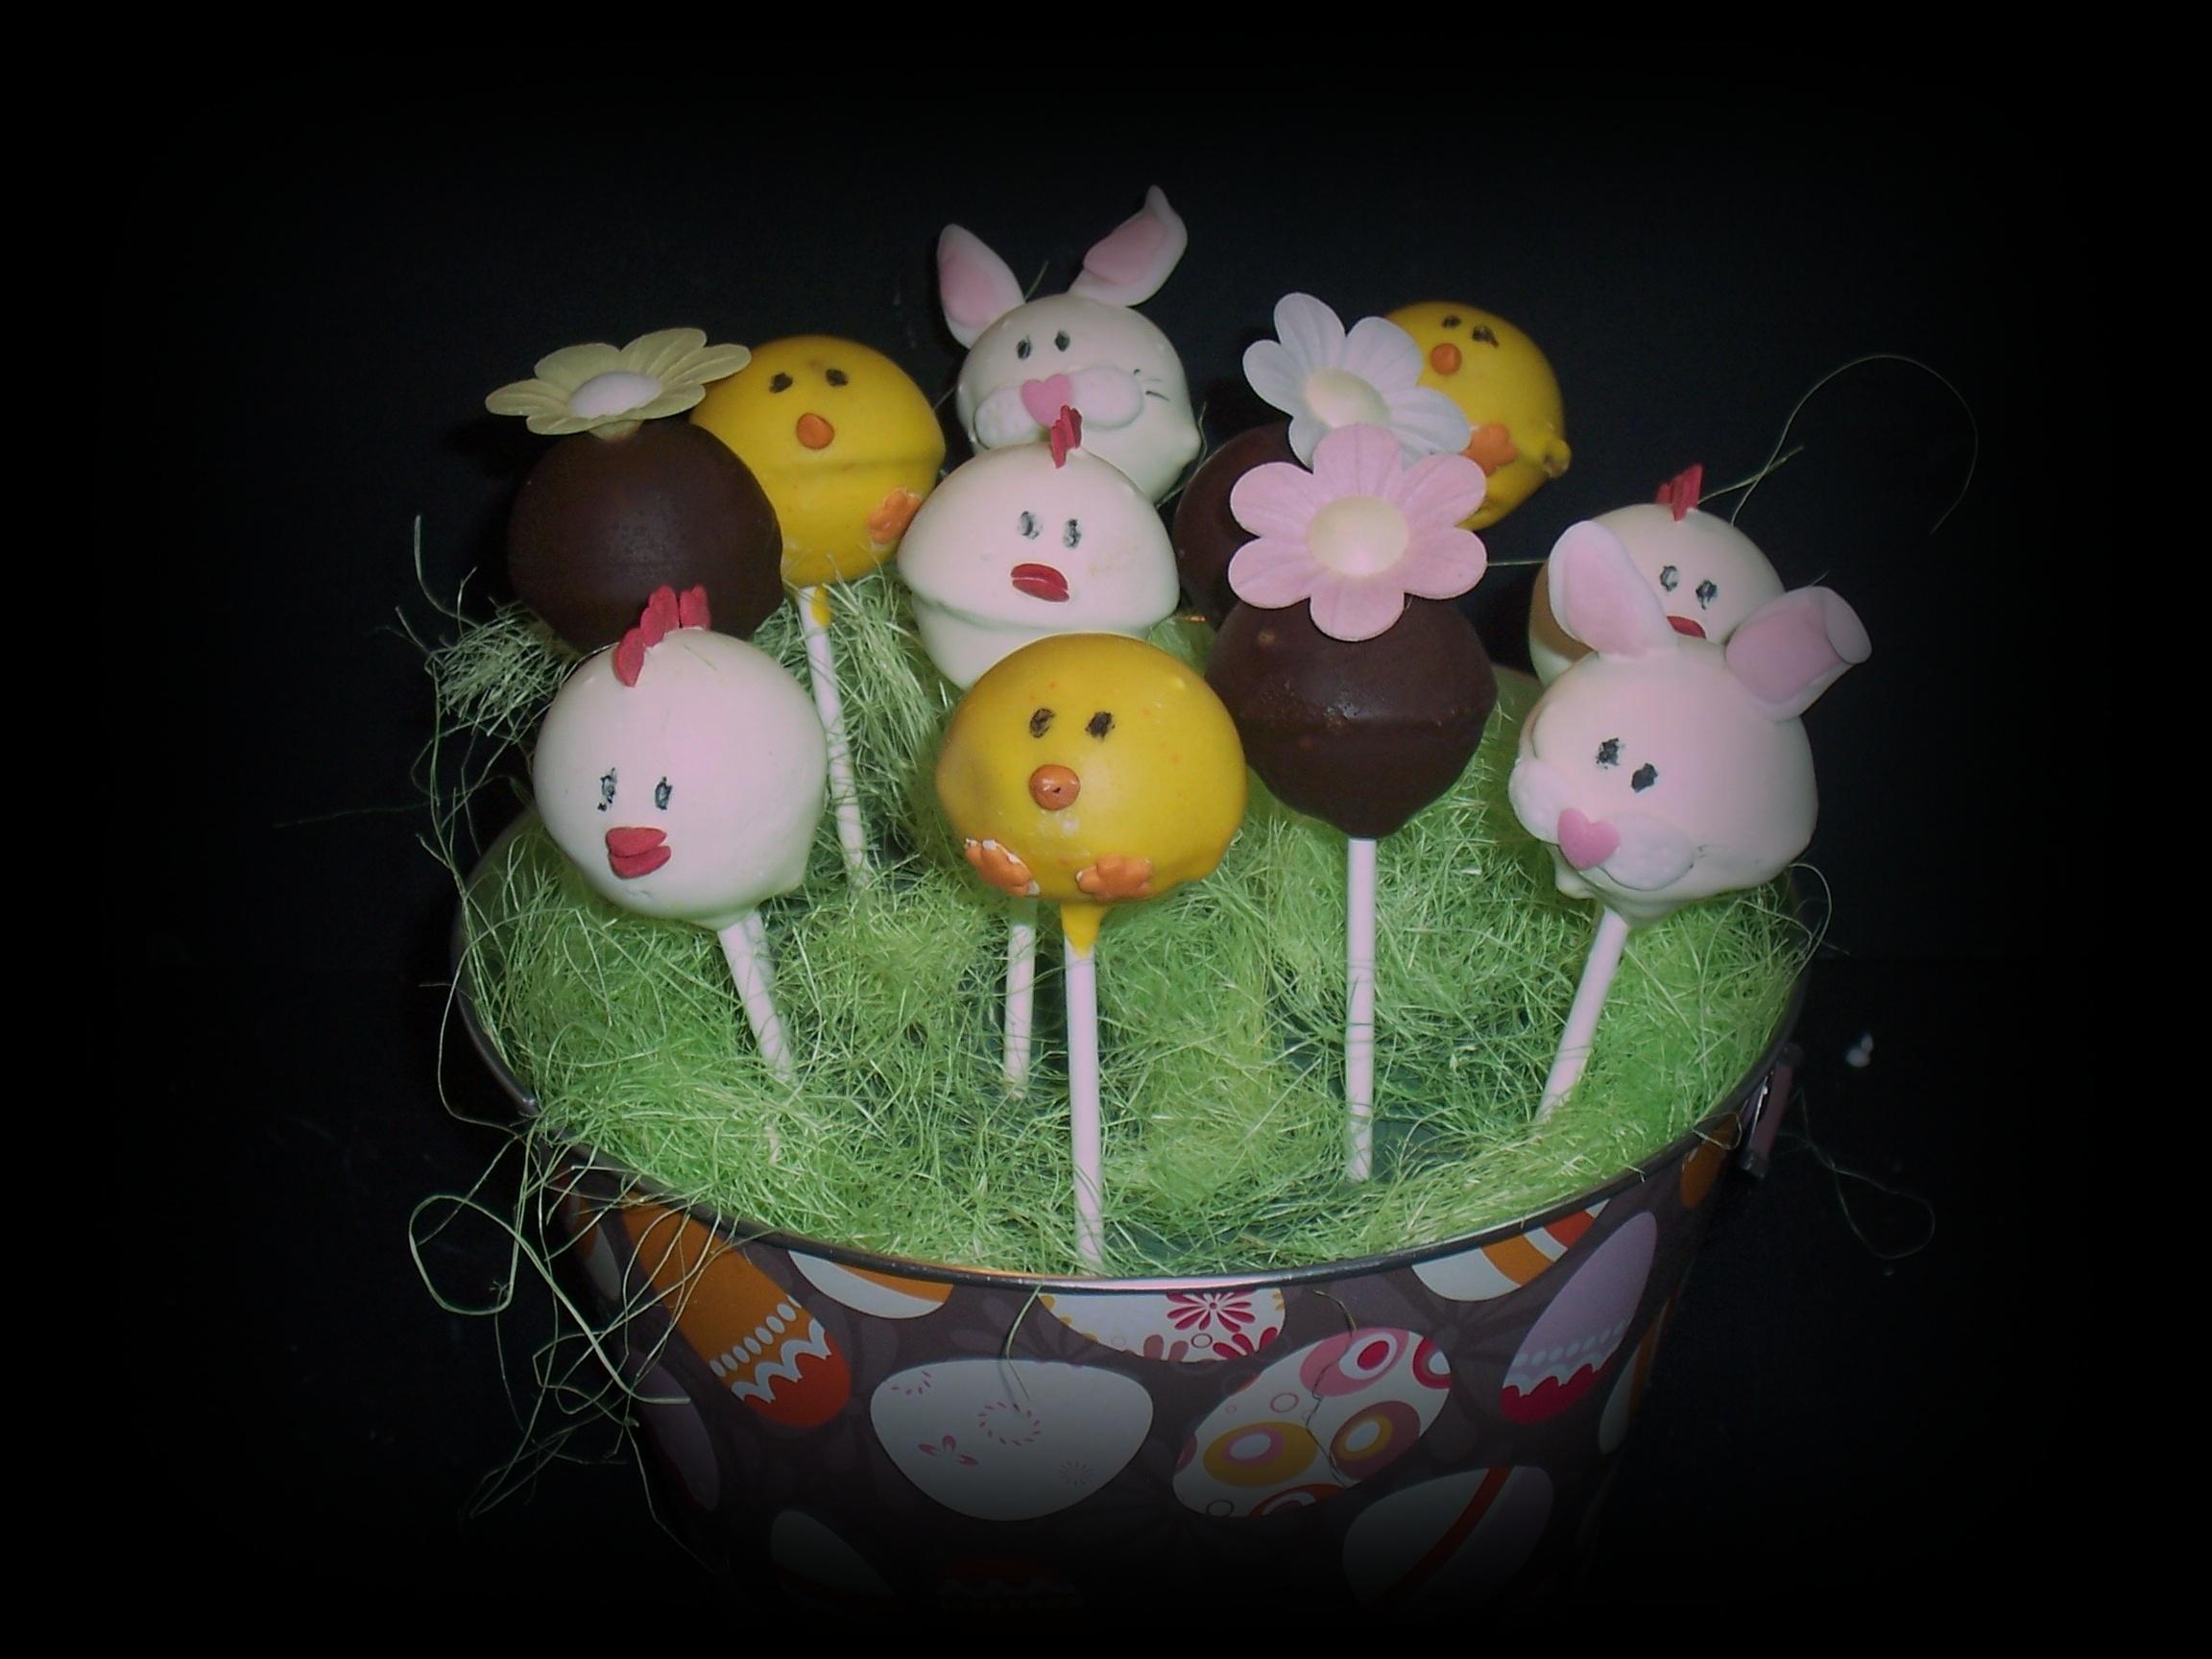 cupcakes cakepops pl tzchen petit fours etc oster cake pops. Black Bedroom Furniture Sets. Home Design Ideas